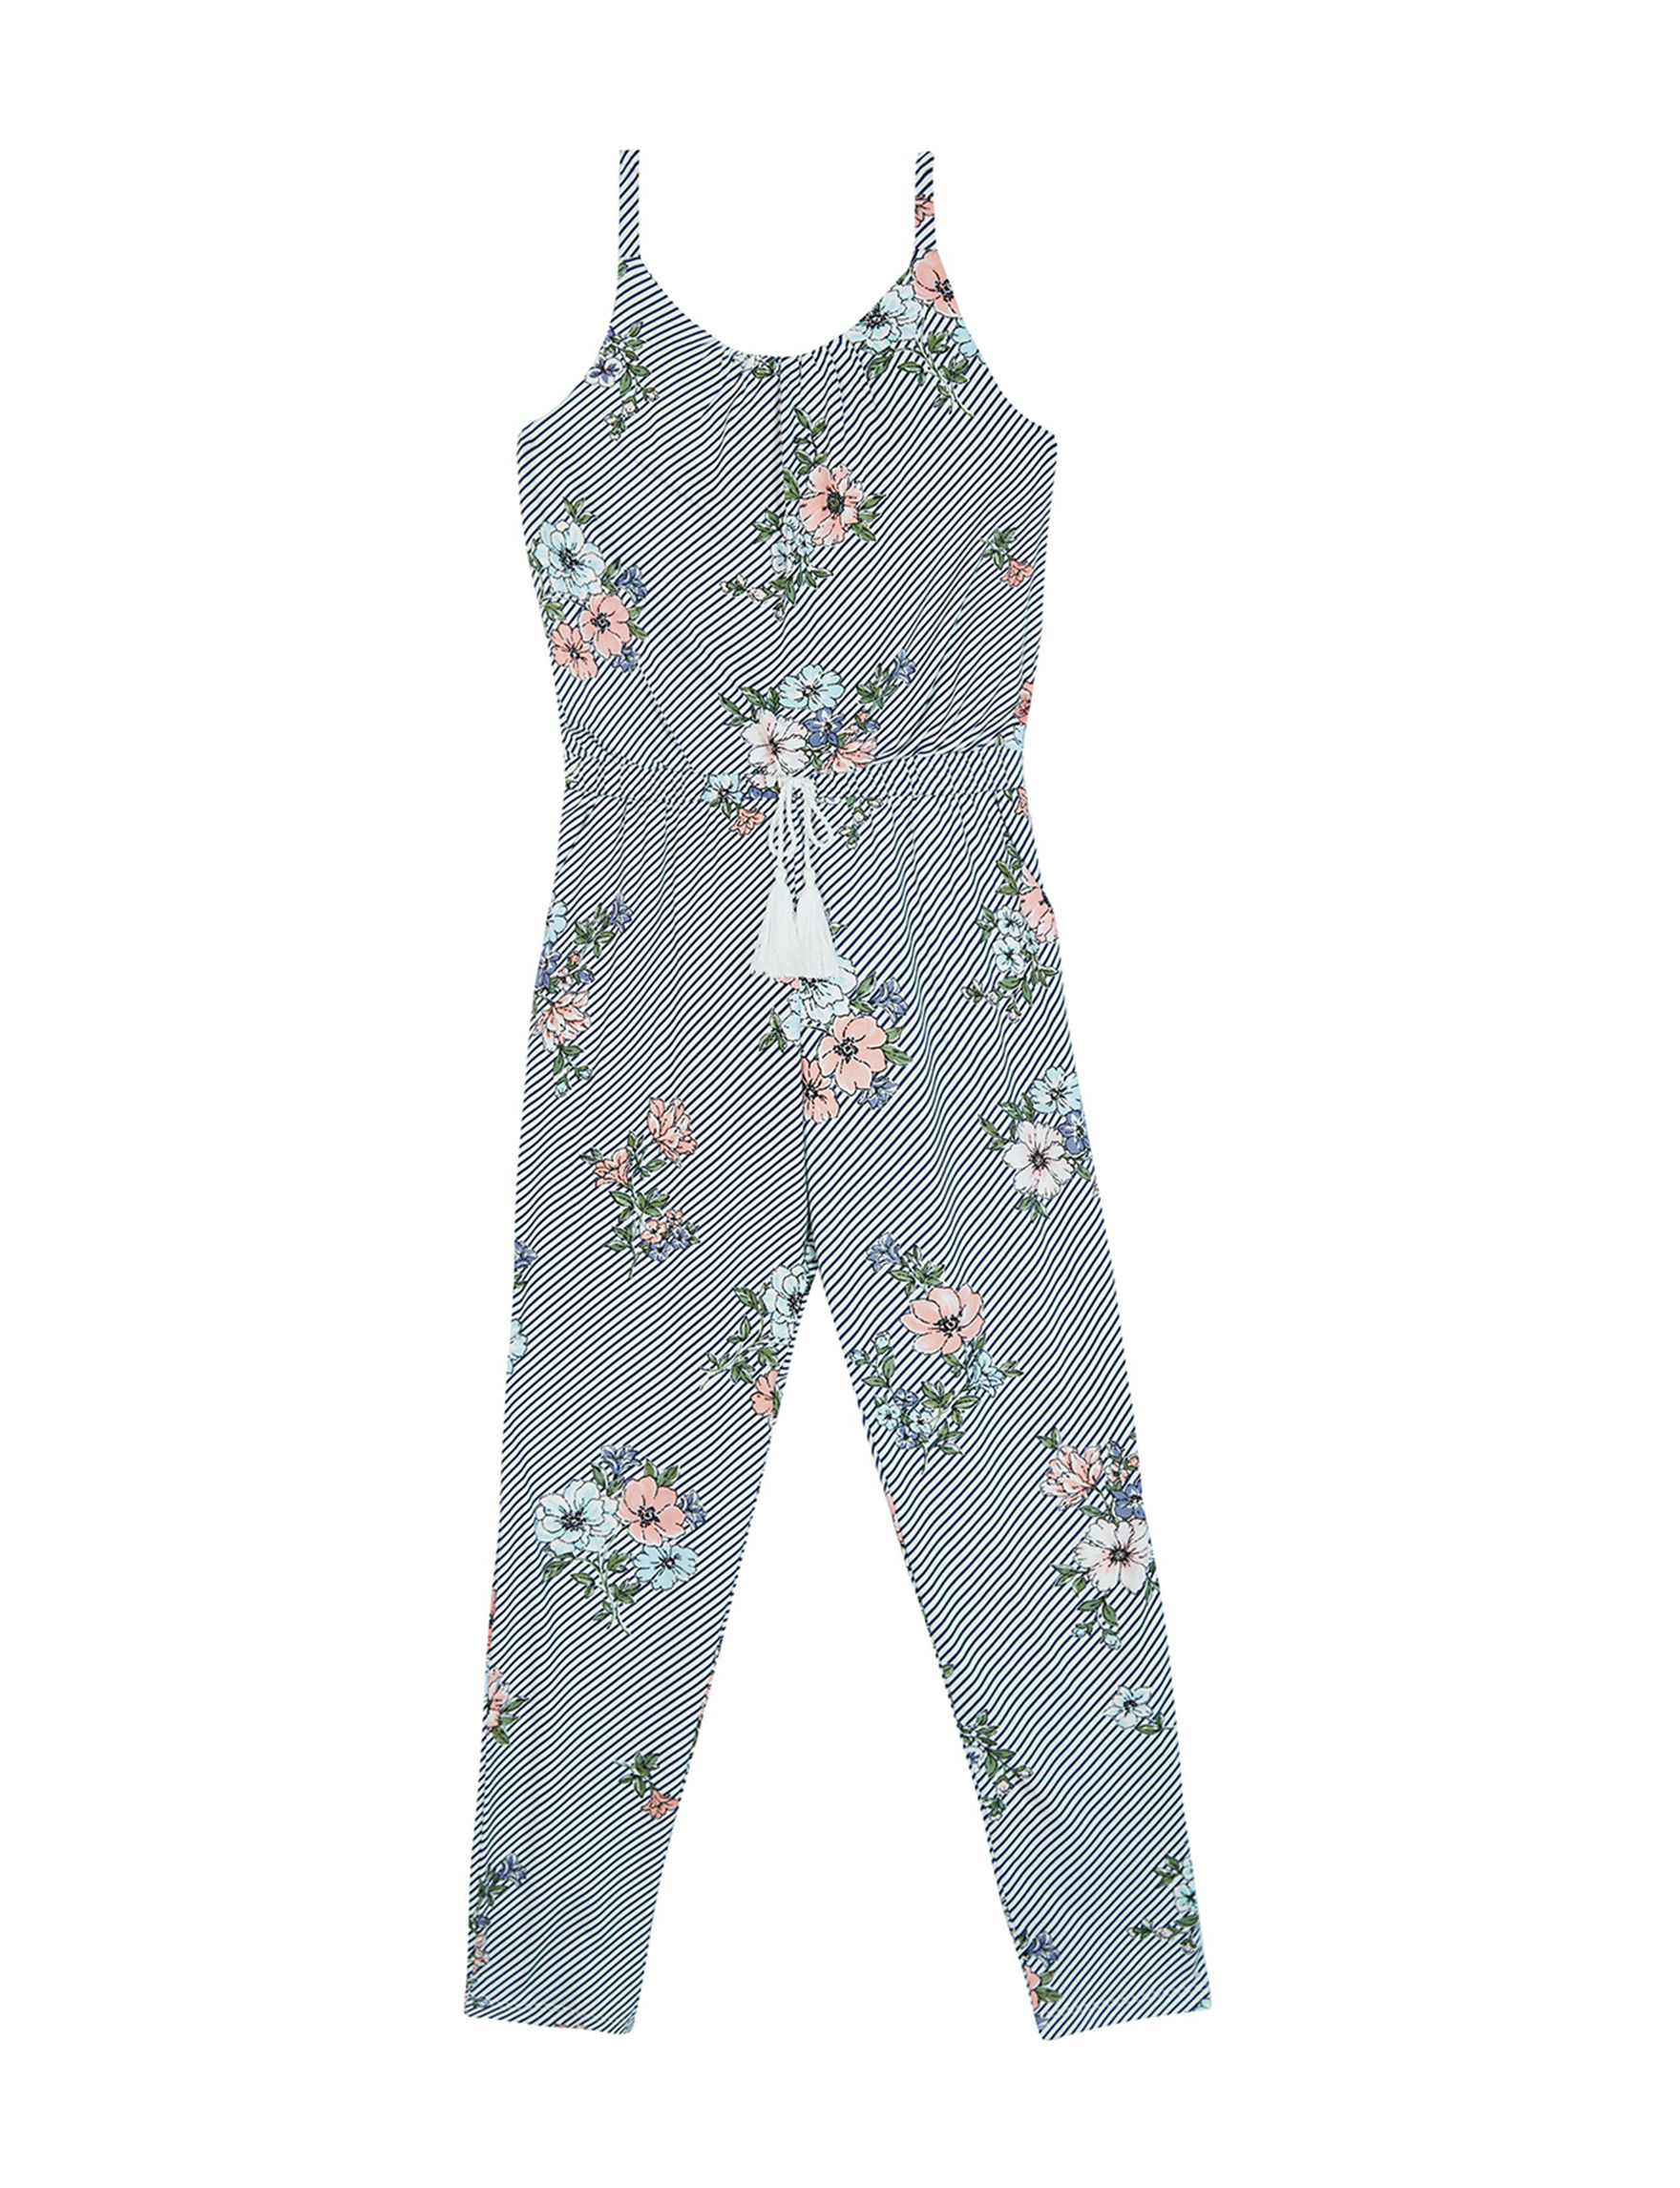 2976124dedc7b Amy Byer Floral Tassel Jumpsuit - Girls 7-16 | Stage Stores